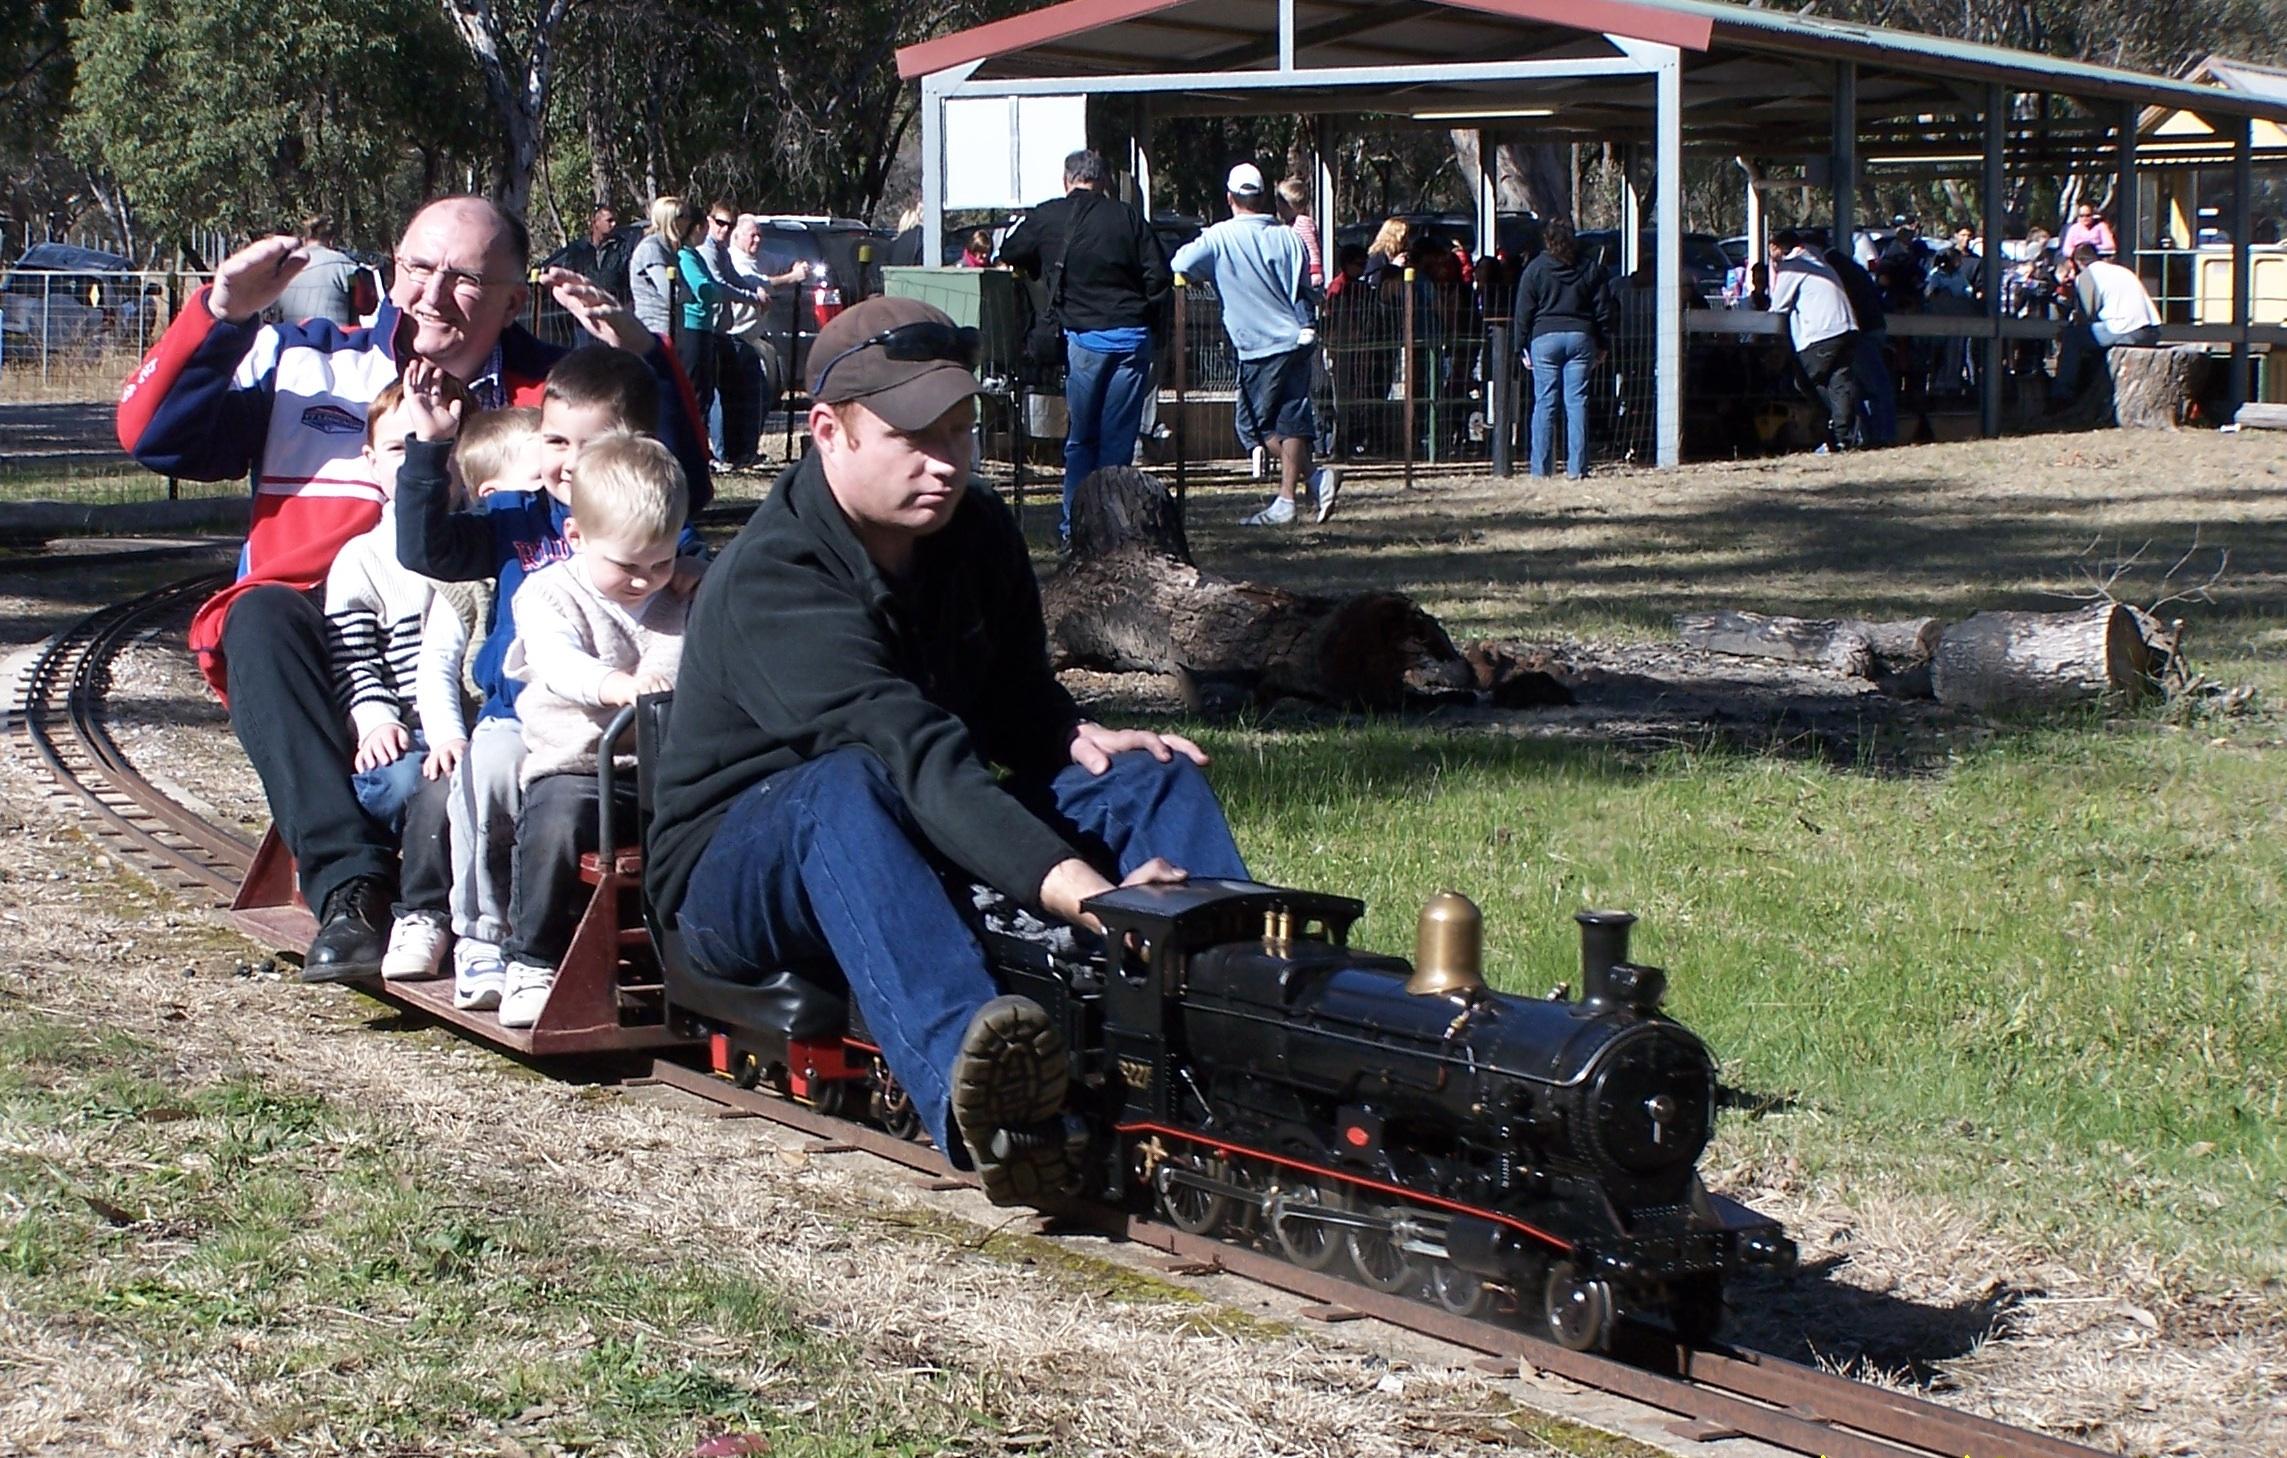 Mudgee Miniature Railway